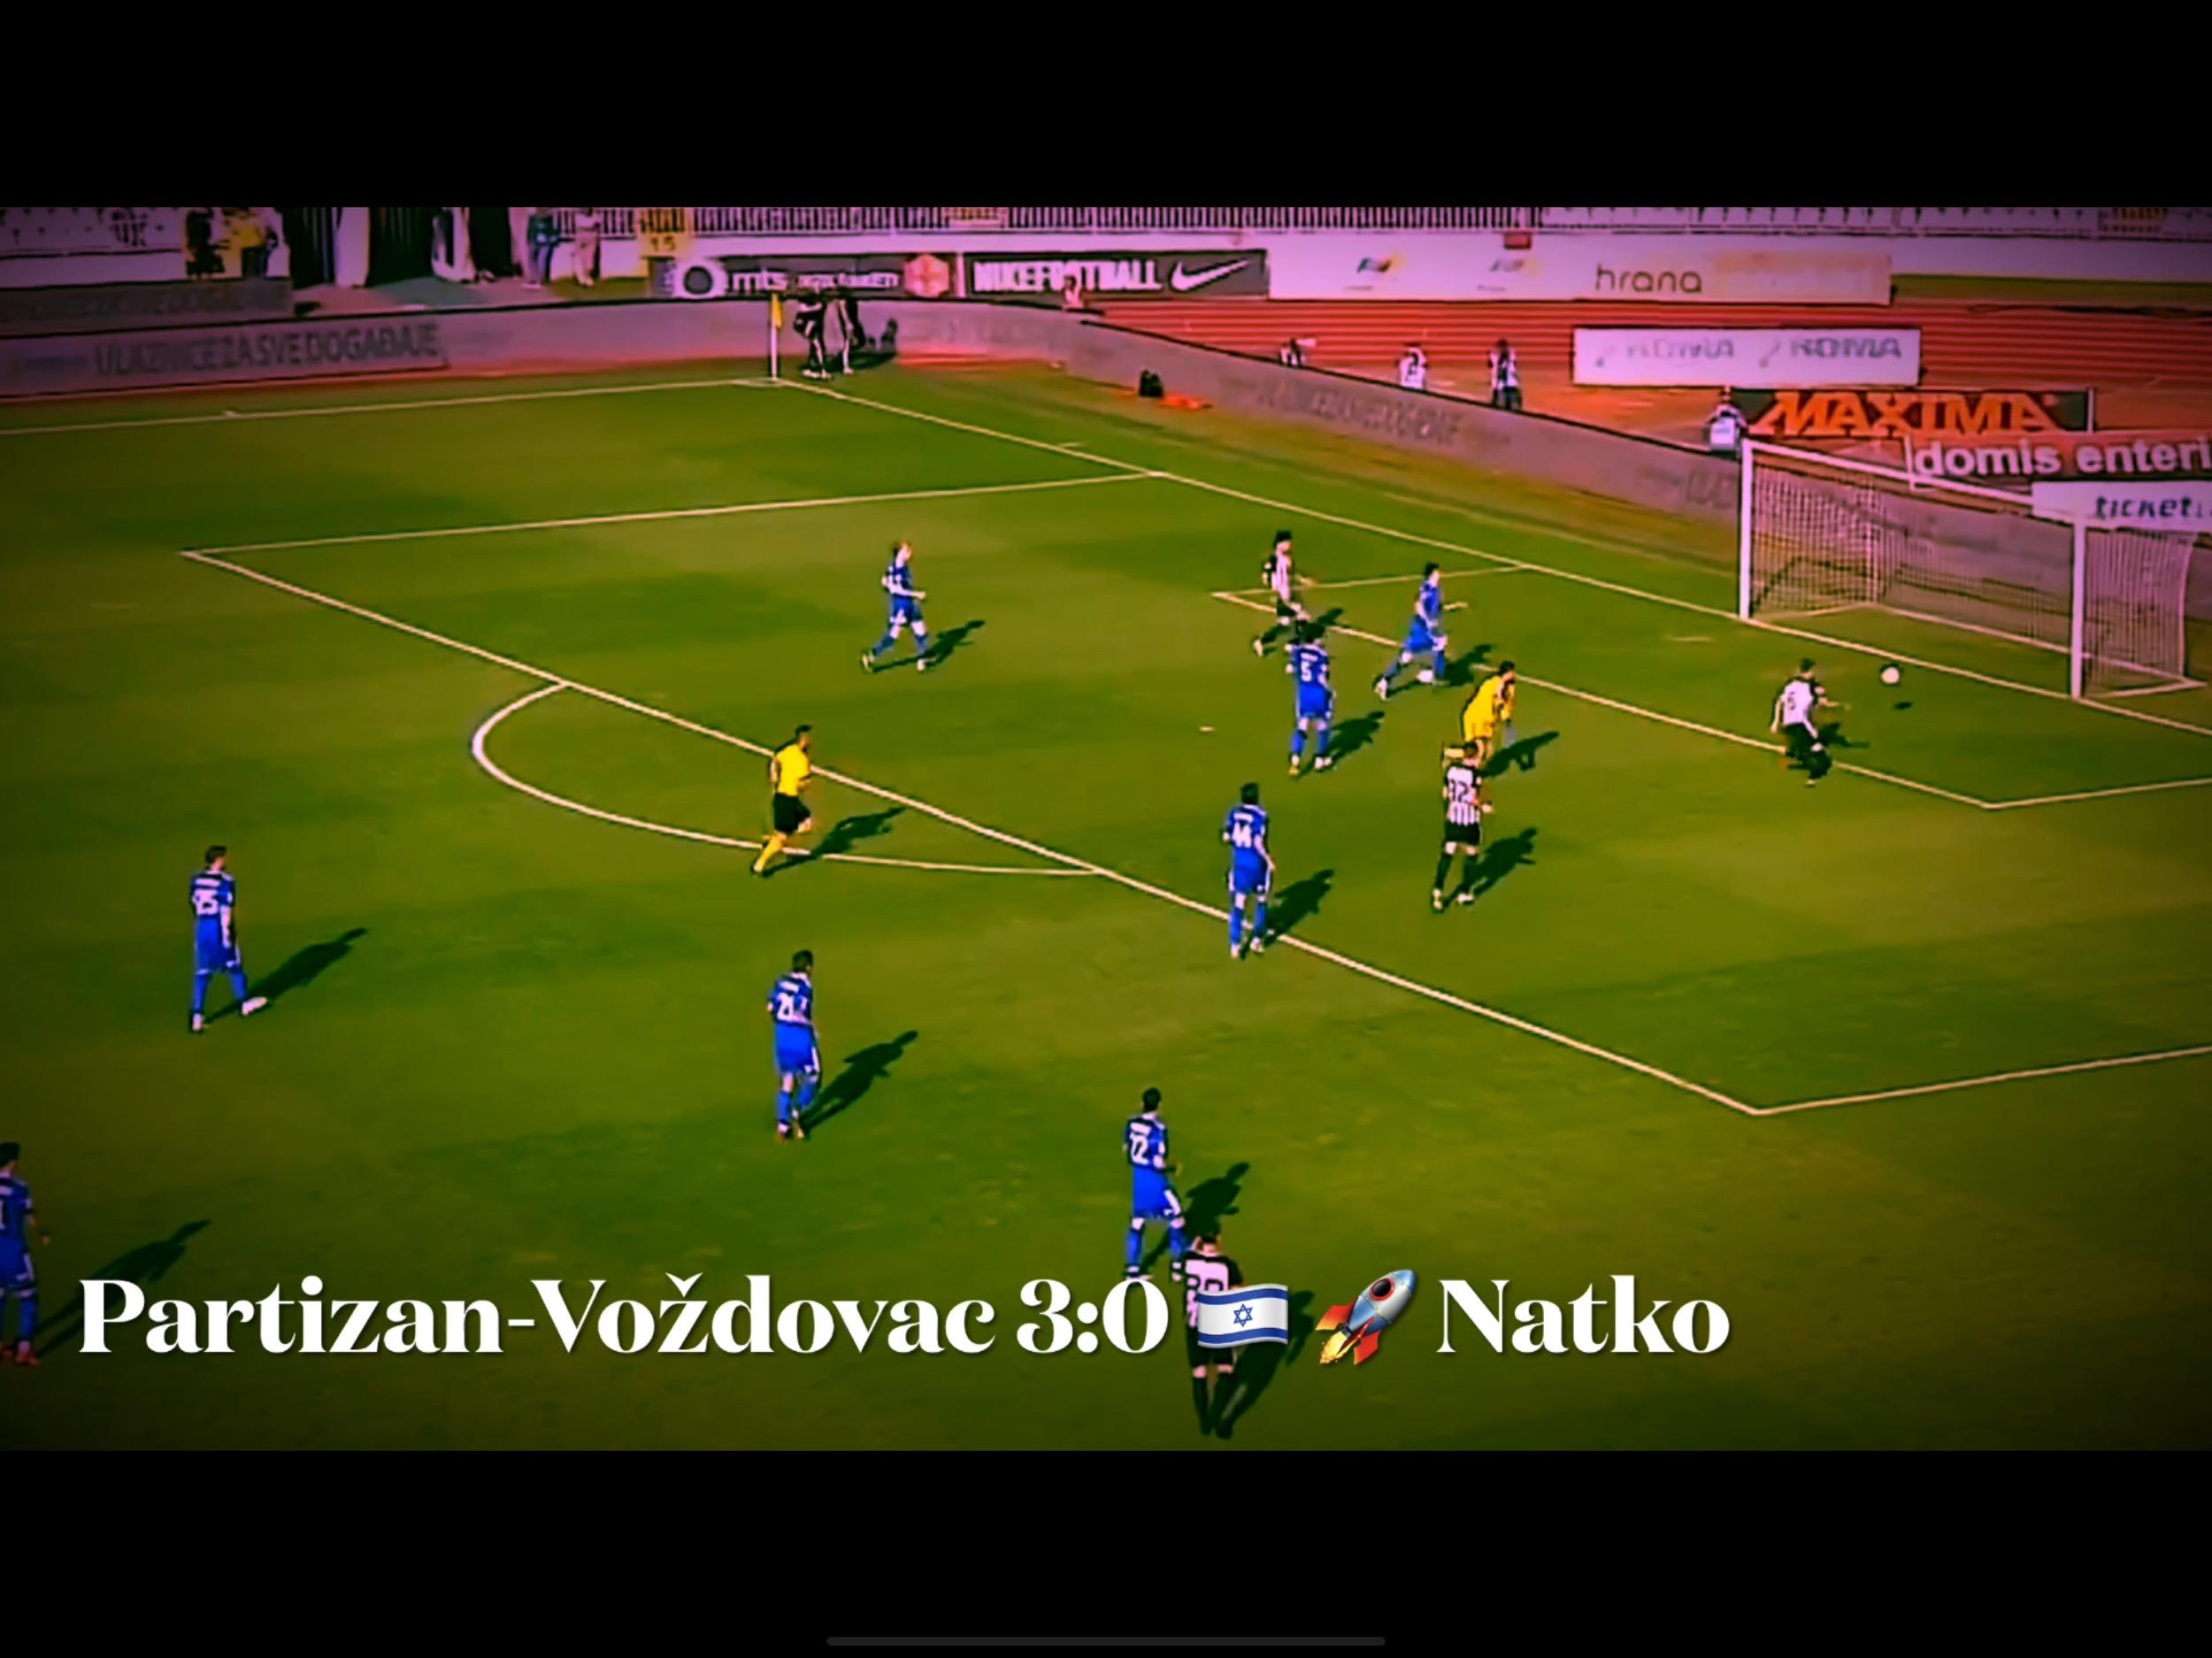 TV Izveštaj: Partizan-Voždovac 3:0. Partizanov Iron Dome sistem, model Bibras Natko…(VIDEO)